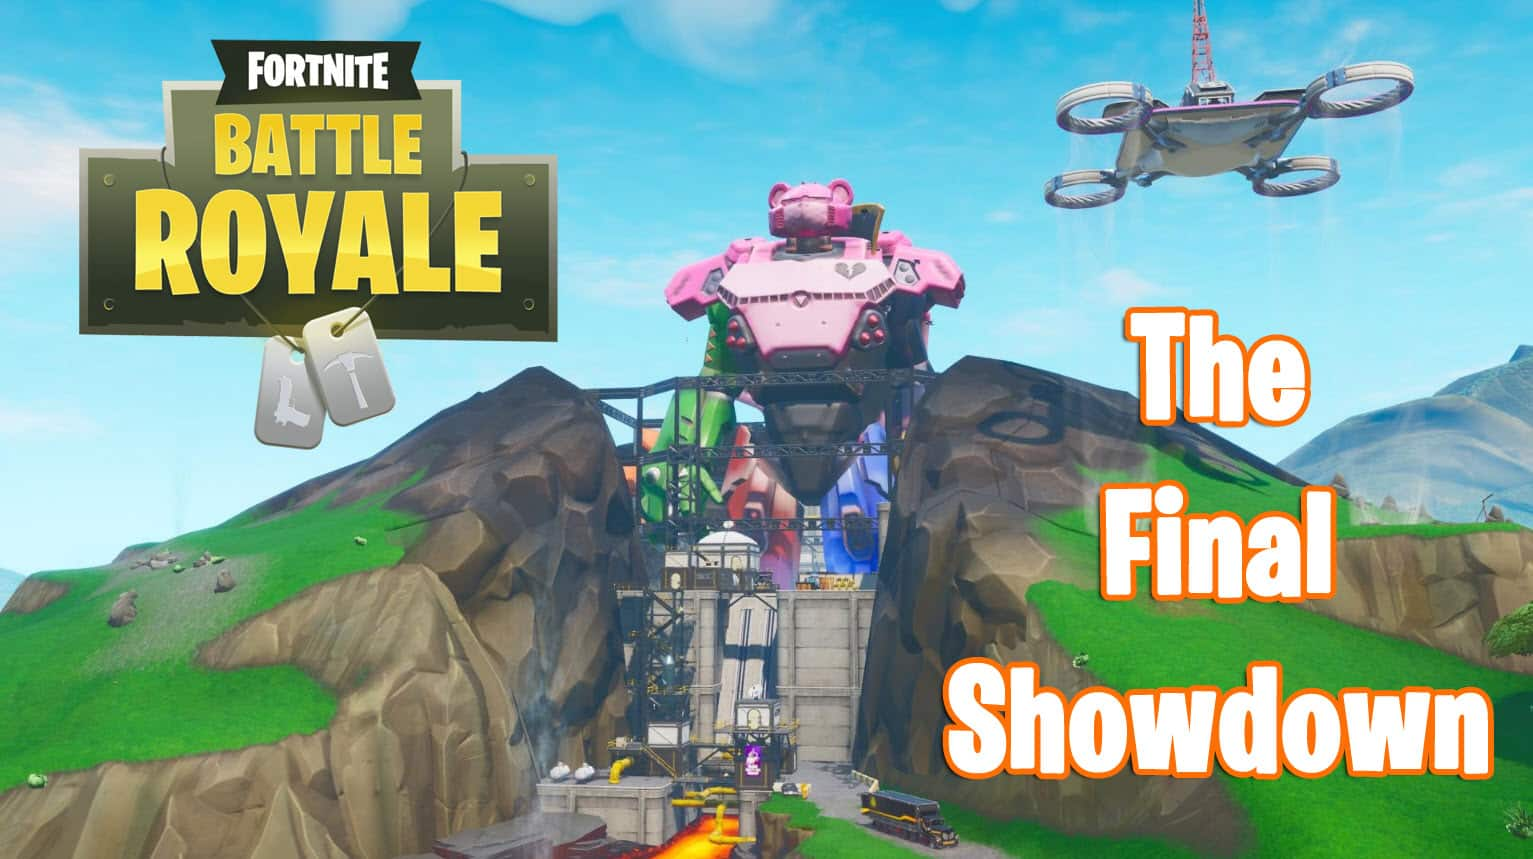 Fortnite Event The Final Showdown